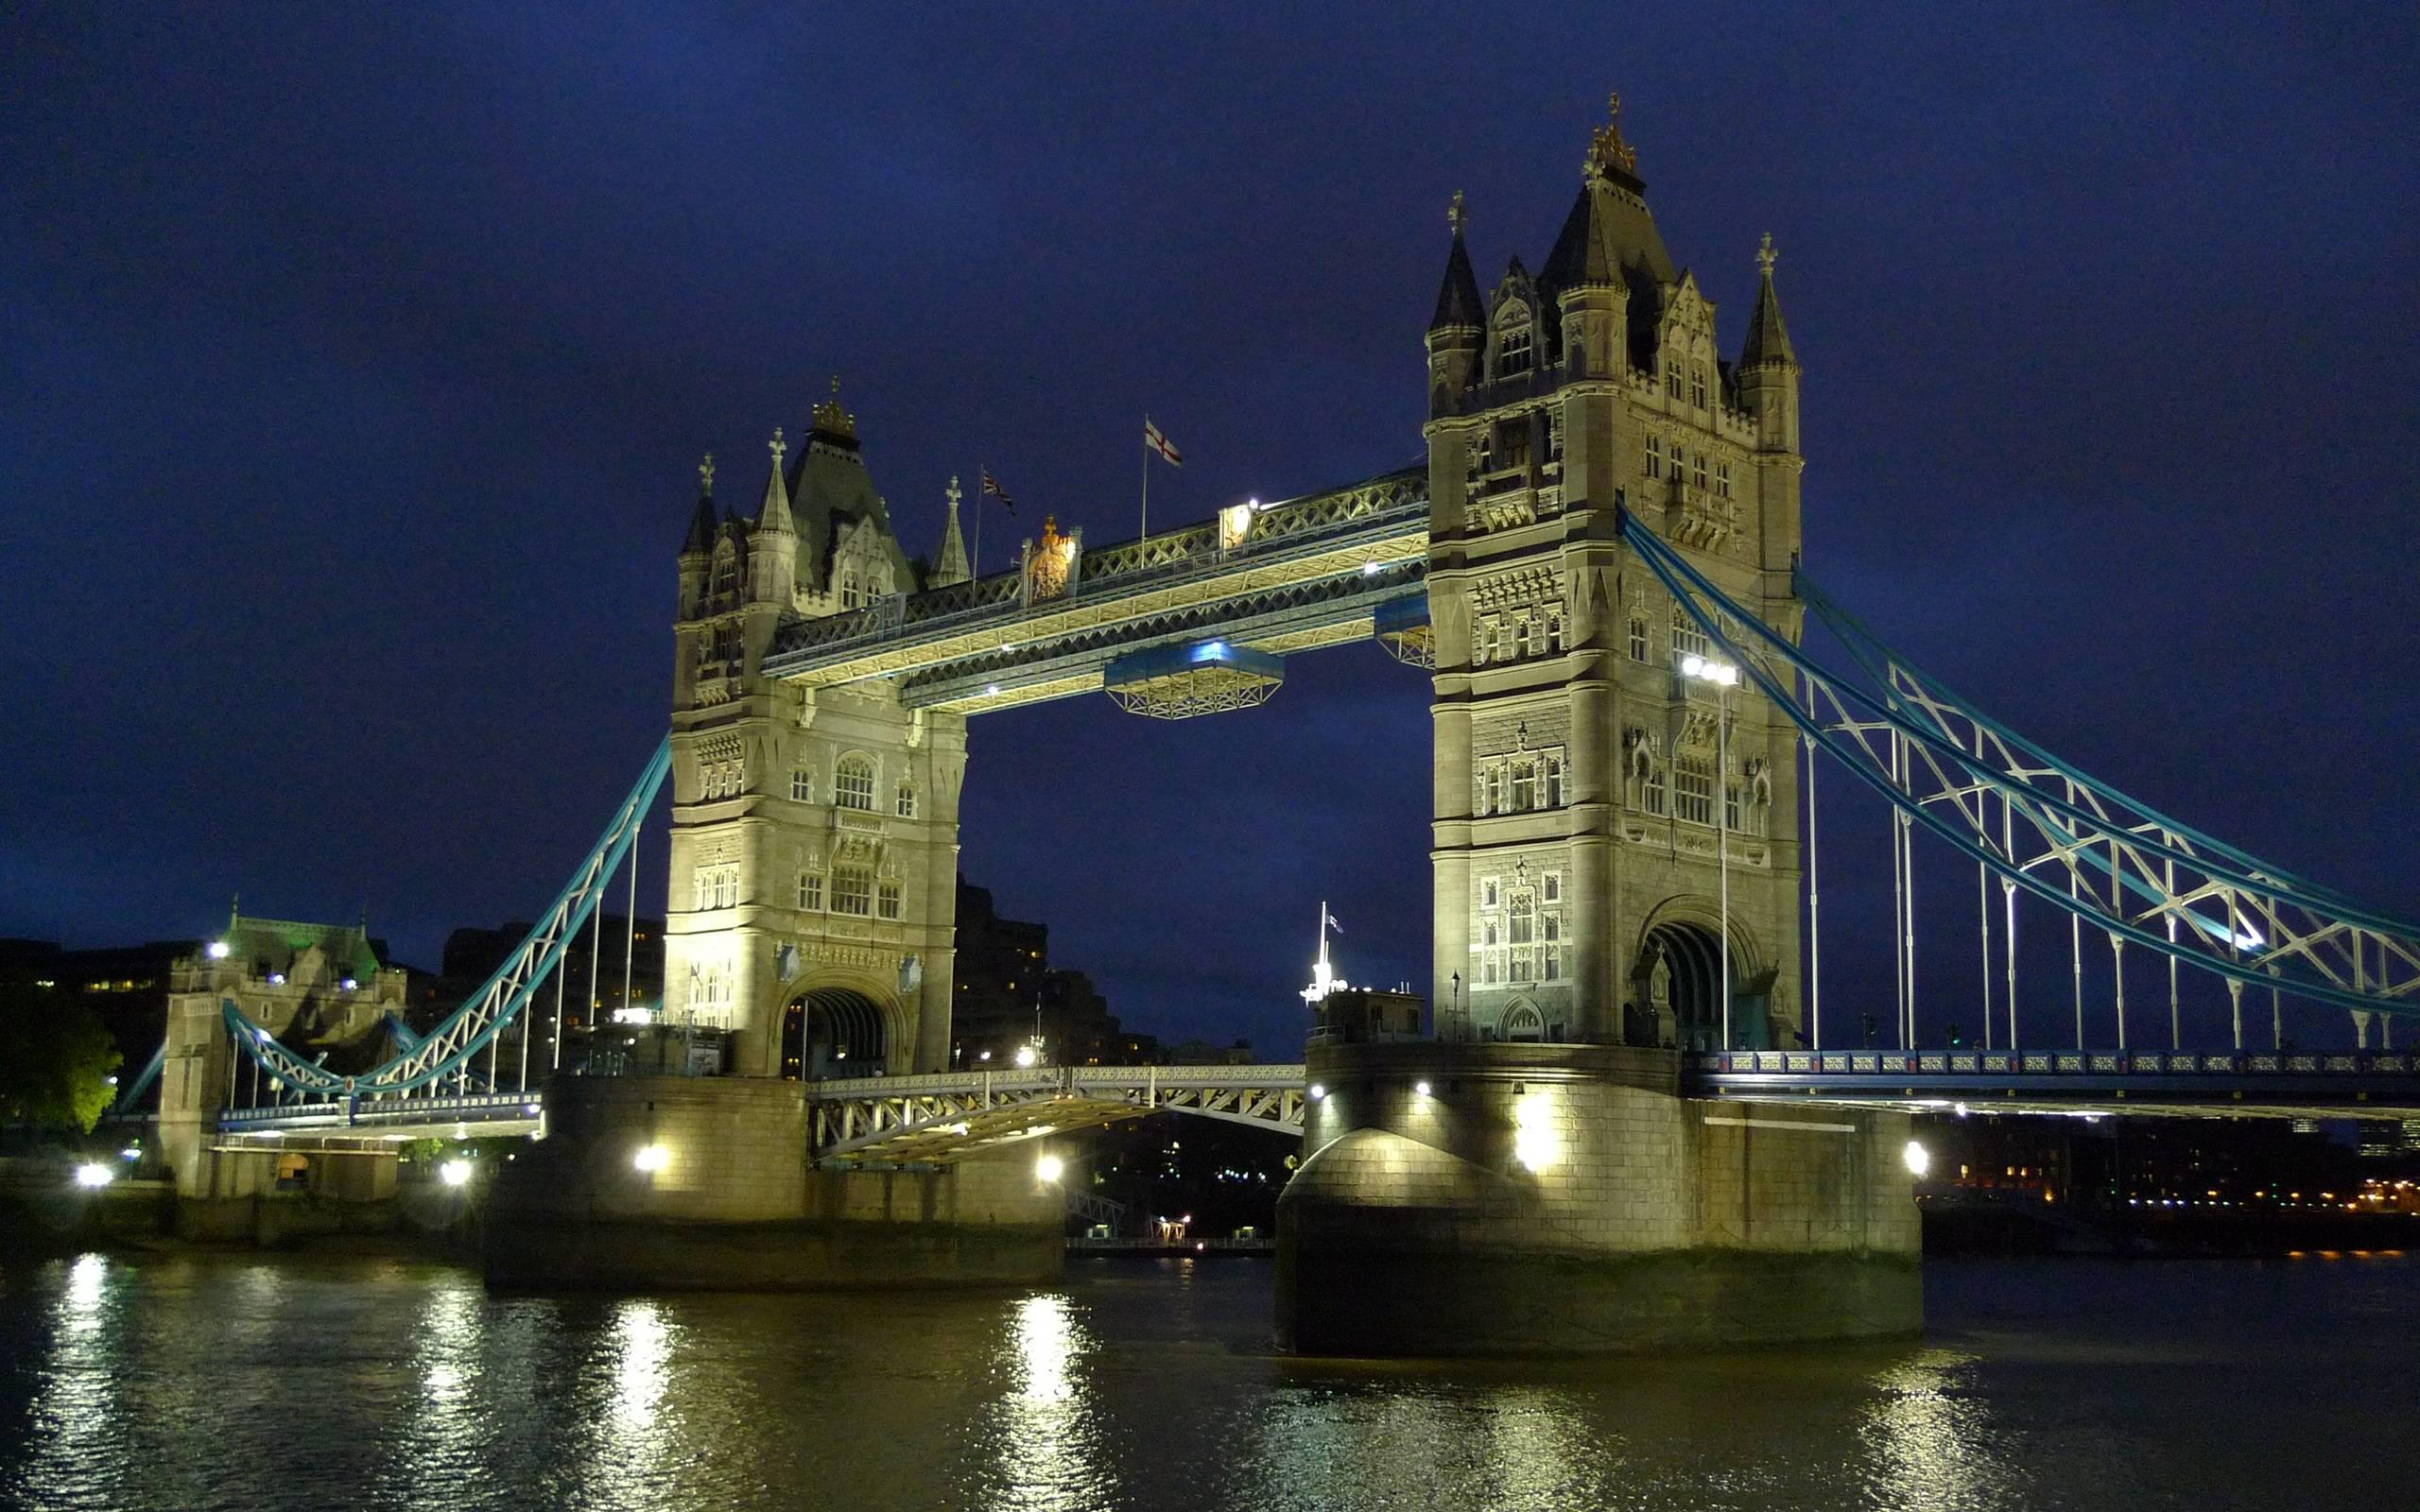 wallpaper bridge london scenic - photo #3